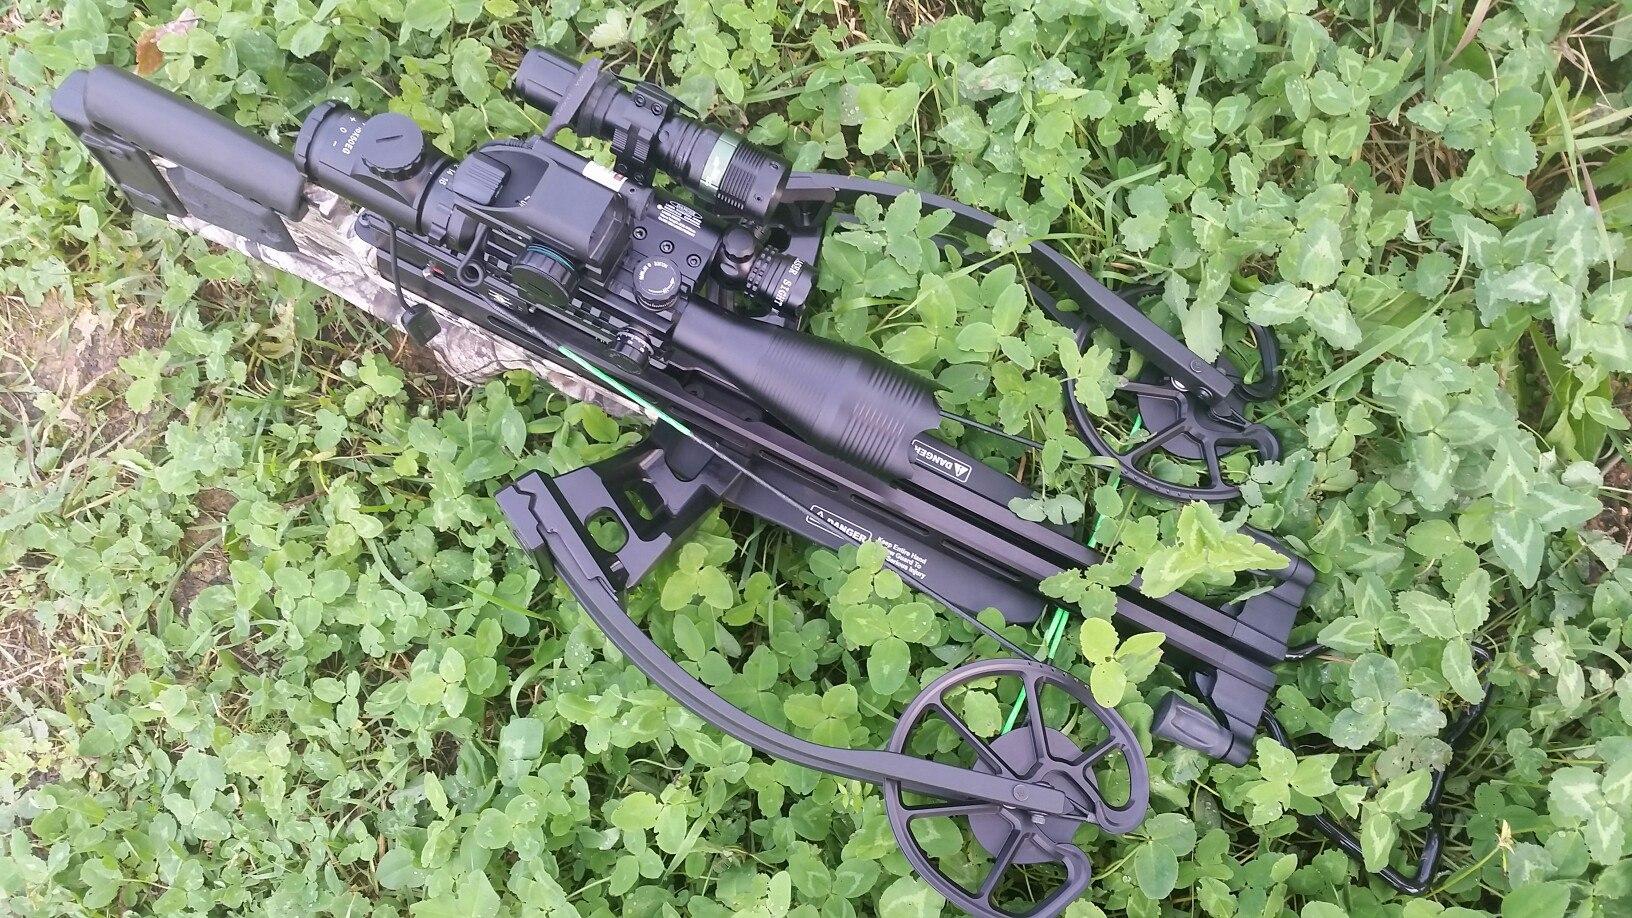 История создания арбалета MAINHUNTER DOOM, BARNETT Buck Commander® Revengeance crossbow, LINYI JUNXING М81 crossbow, арбалет TENPOINT Nitro XRT, WickedRidge Vortec RDX